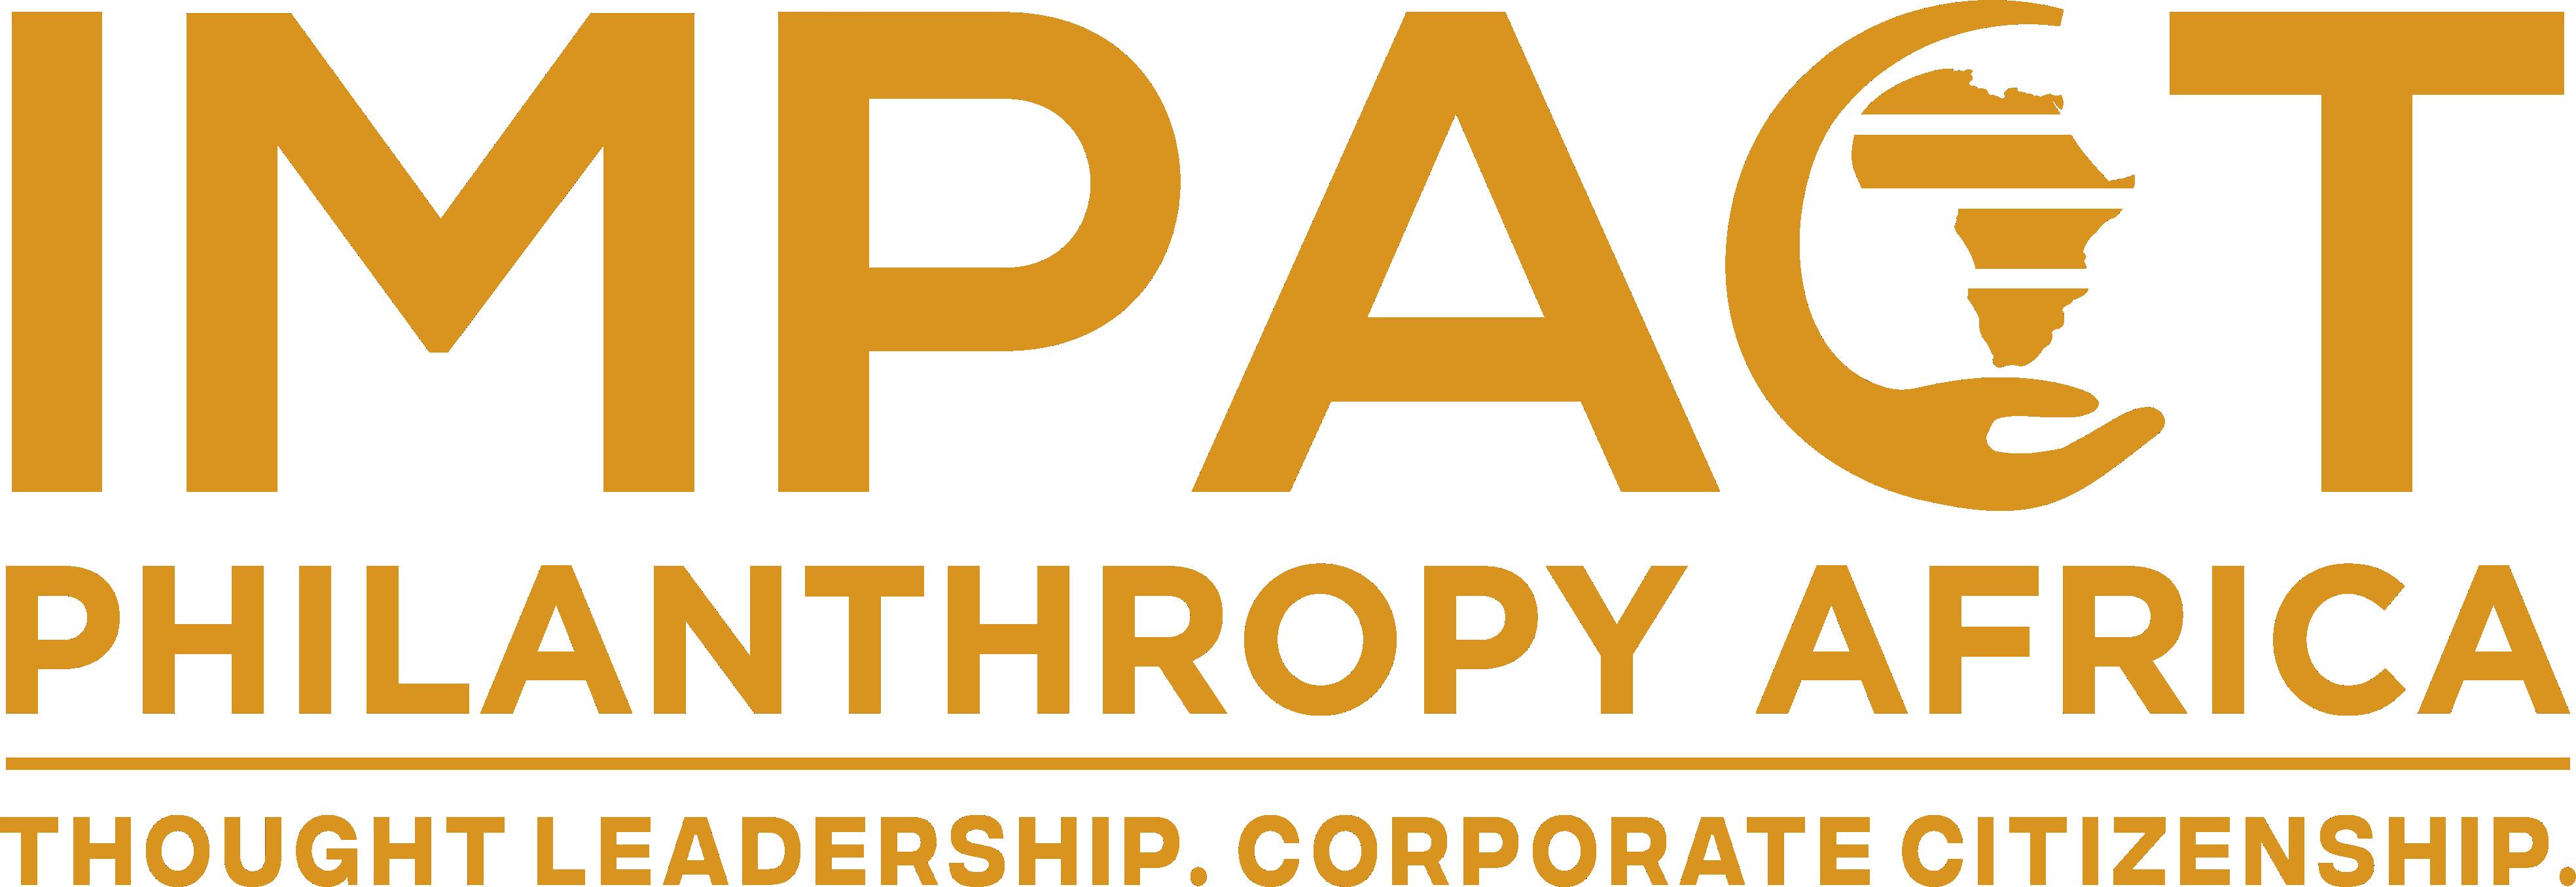 Impact Philanthropy Africa Logo